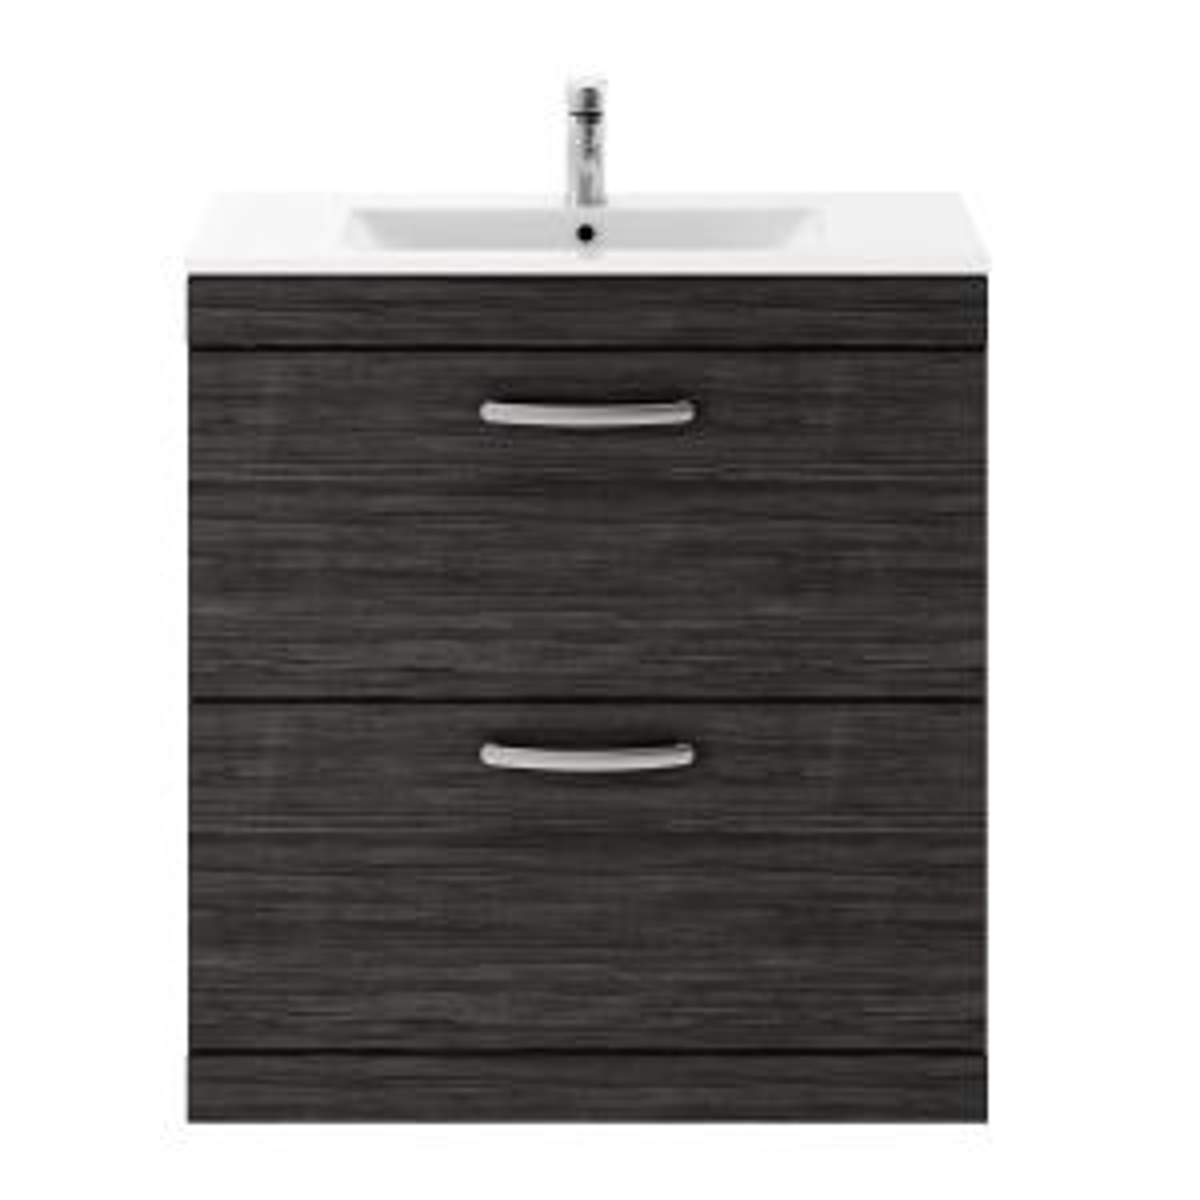 Nuie Athena Hacienda Black 2 Drawer Floor Standing Vanity Unit with 18mm Profile Basin 800mm